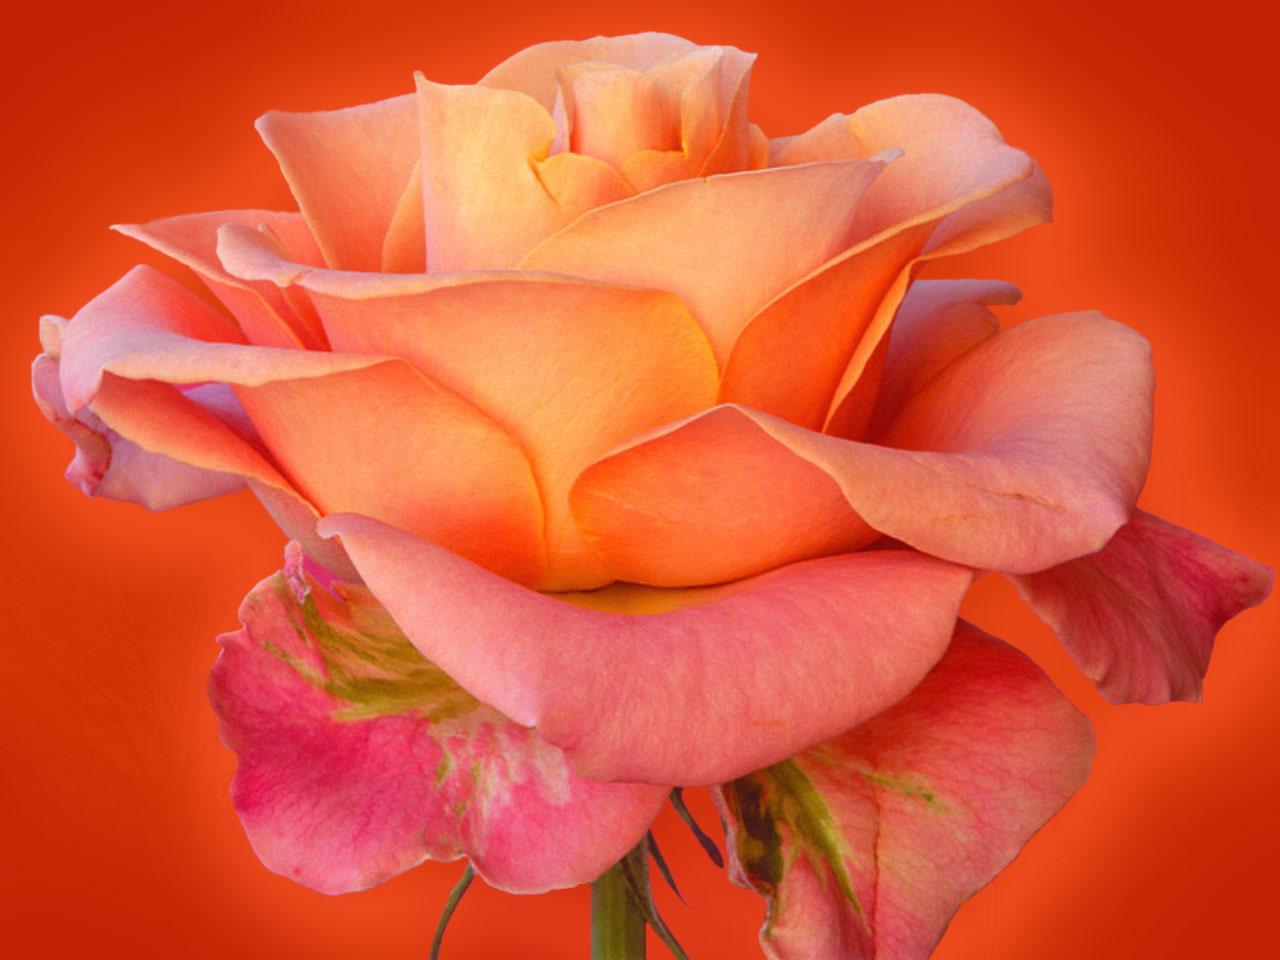 live rose wallpaper